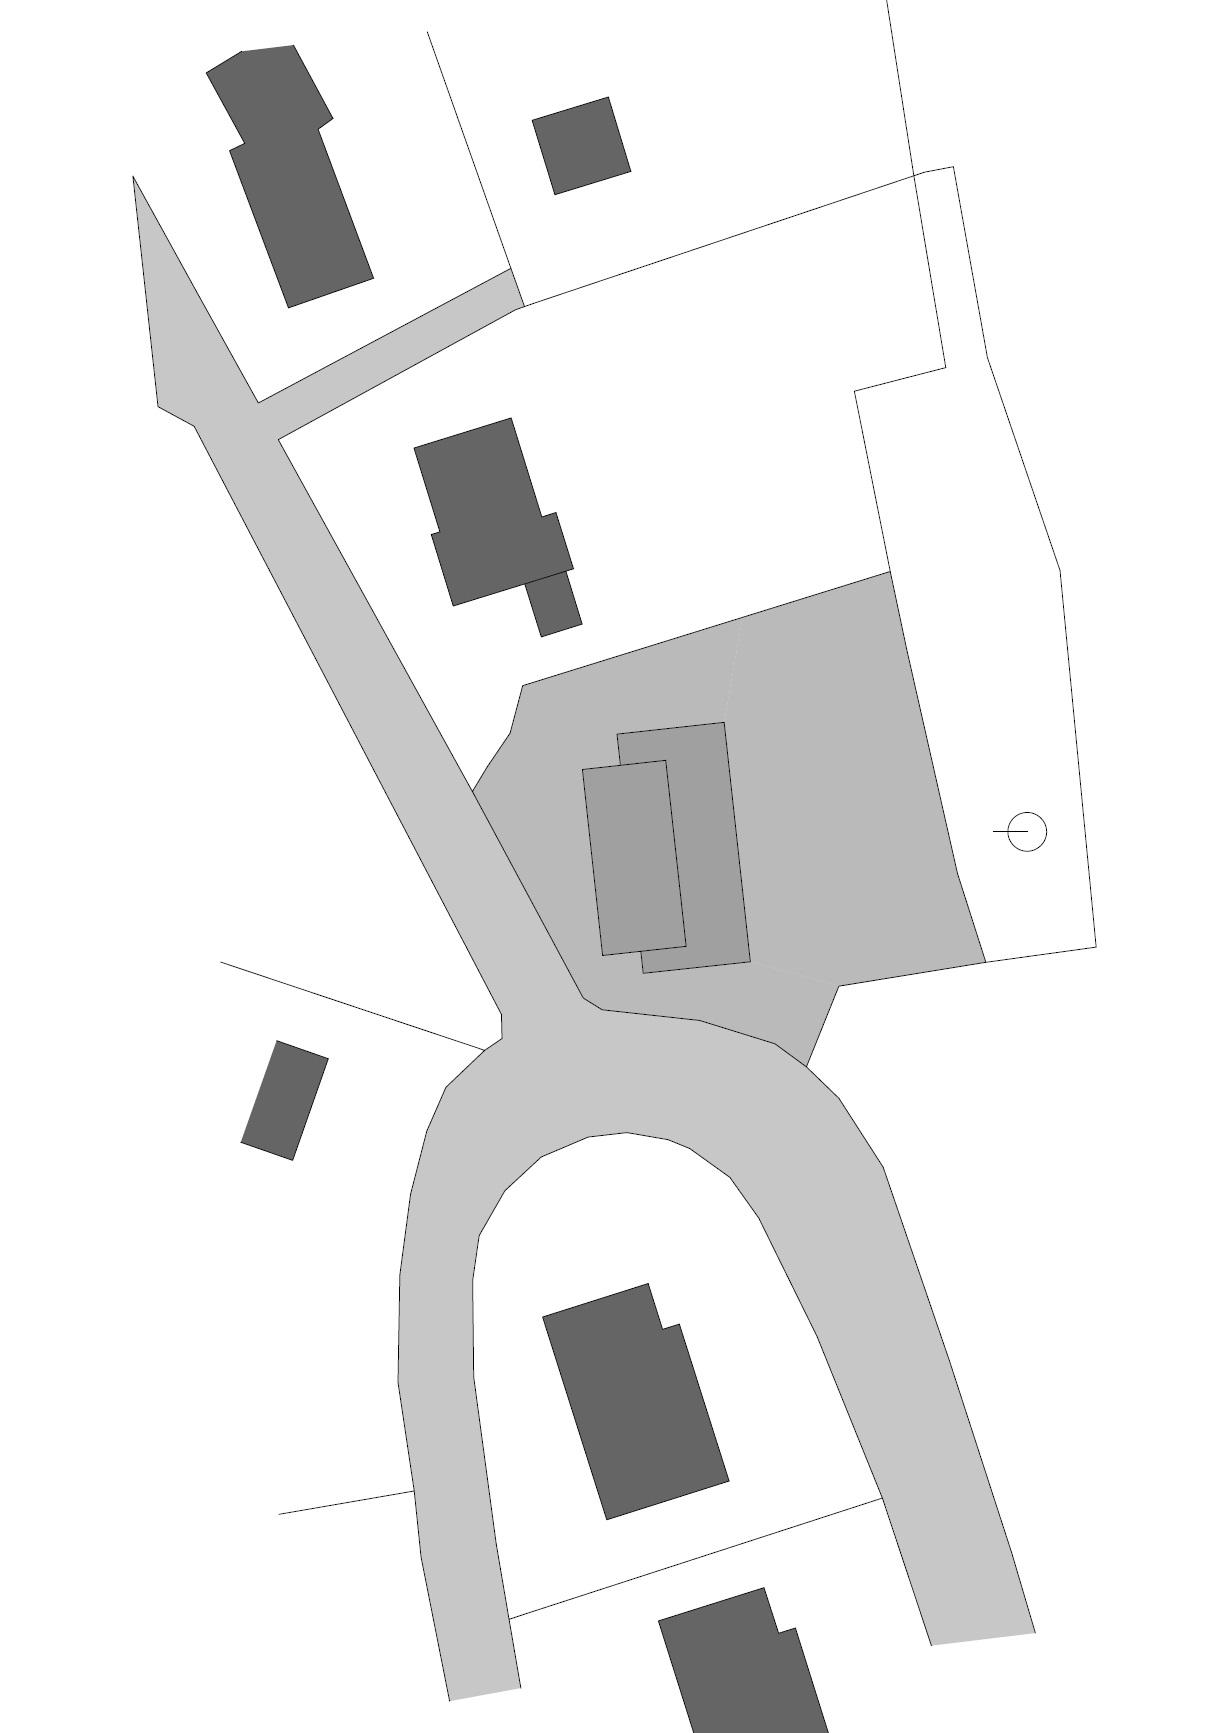 Site Plan, Hillside Home in Weinfelden, Switzerland